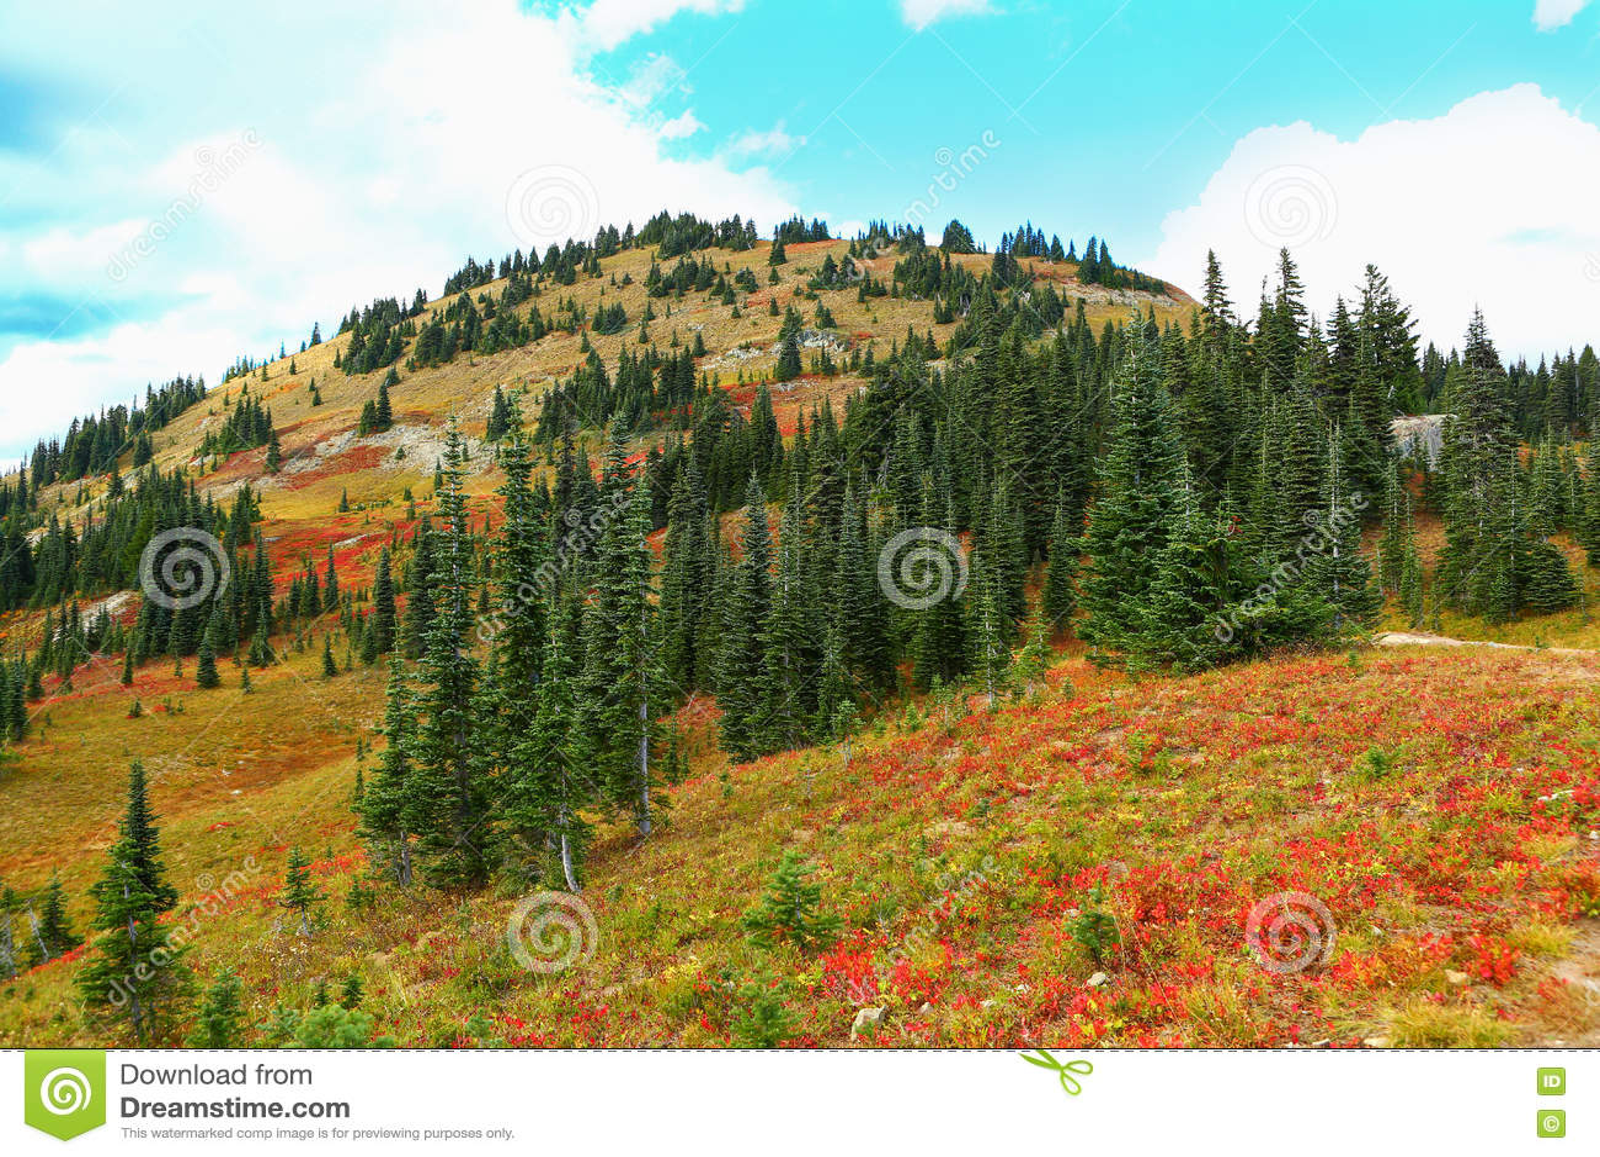 Mount Rainier, Washington. Fall red flowers